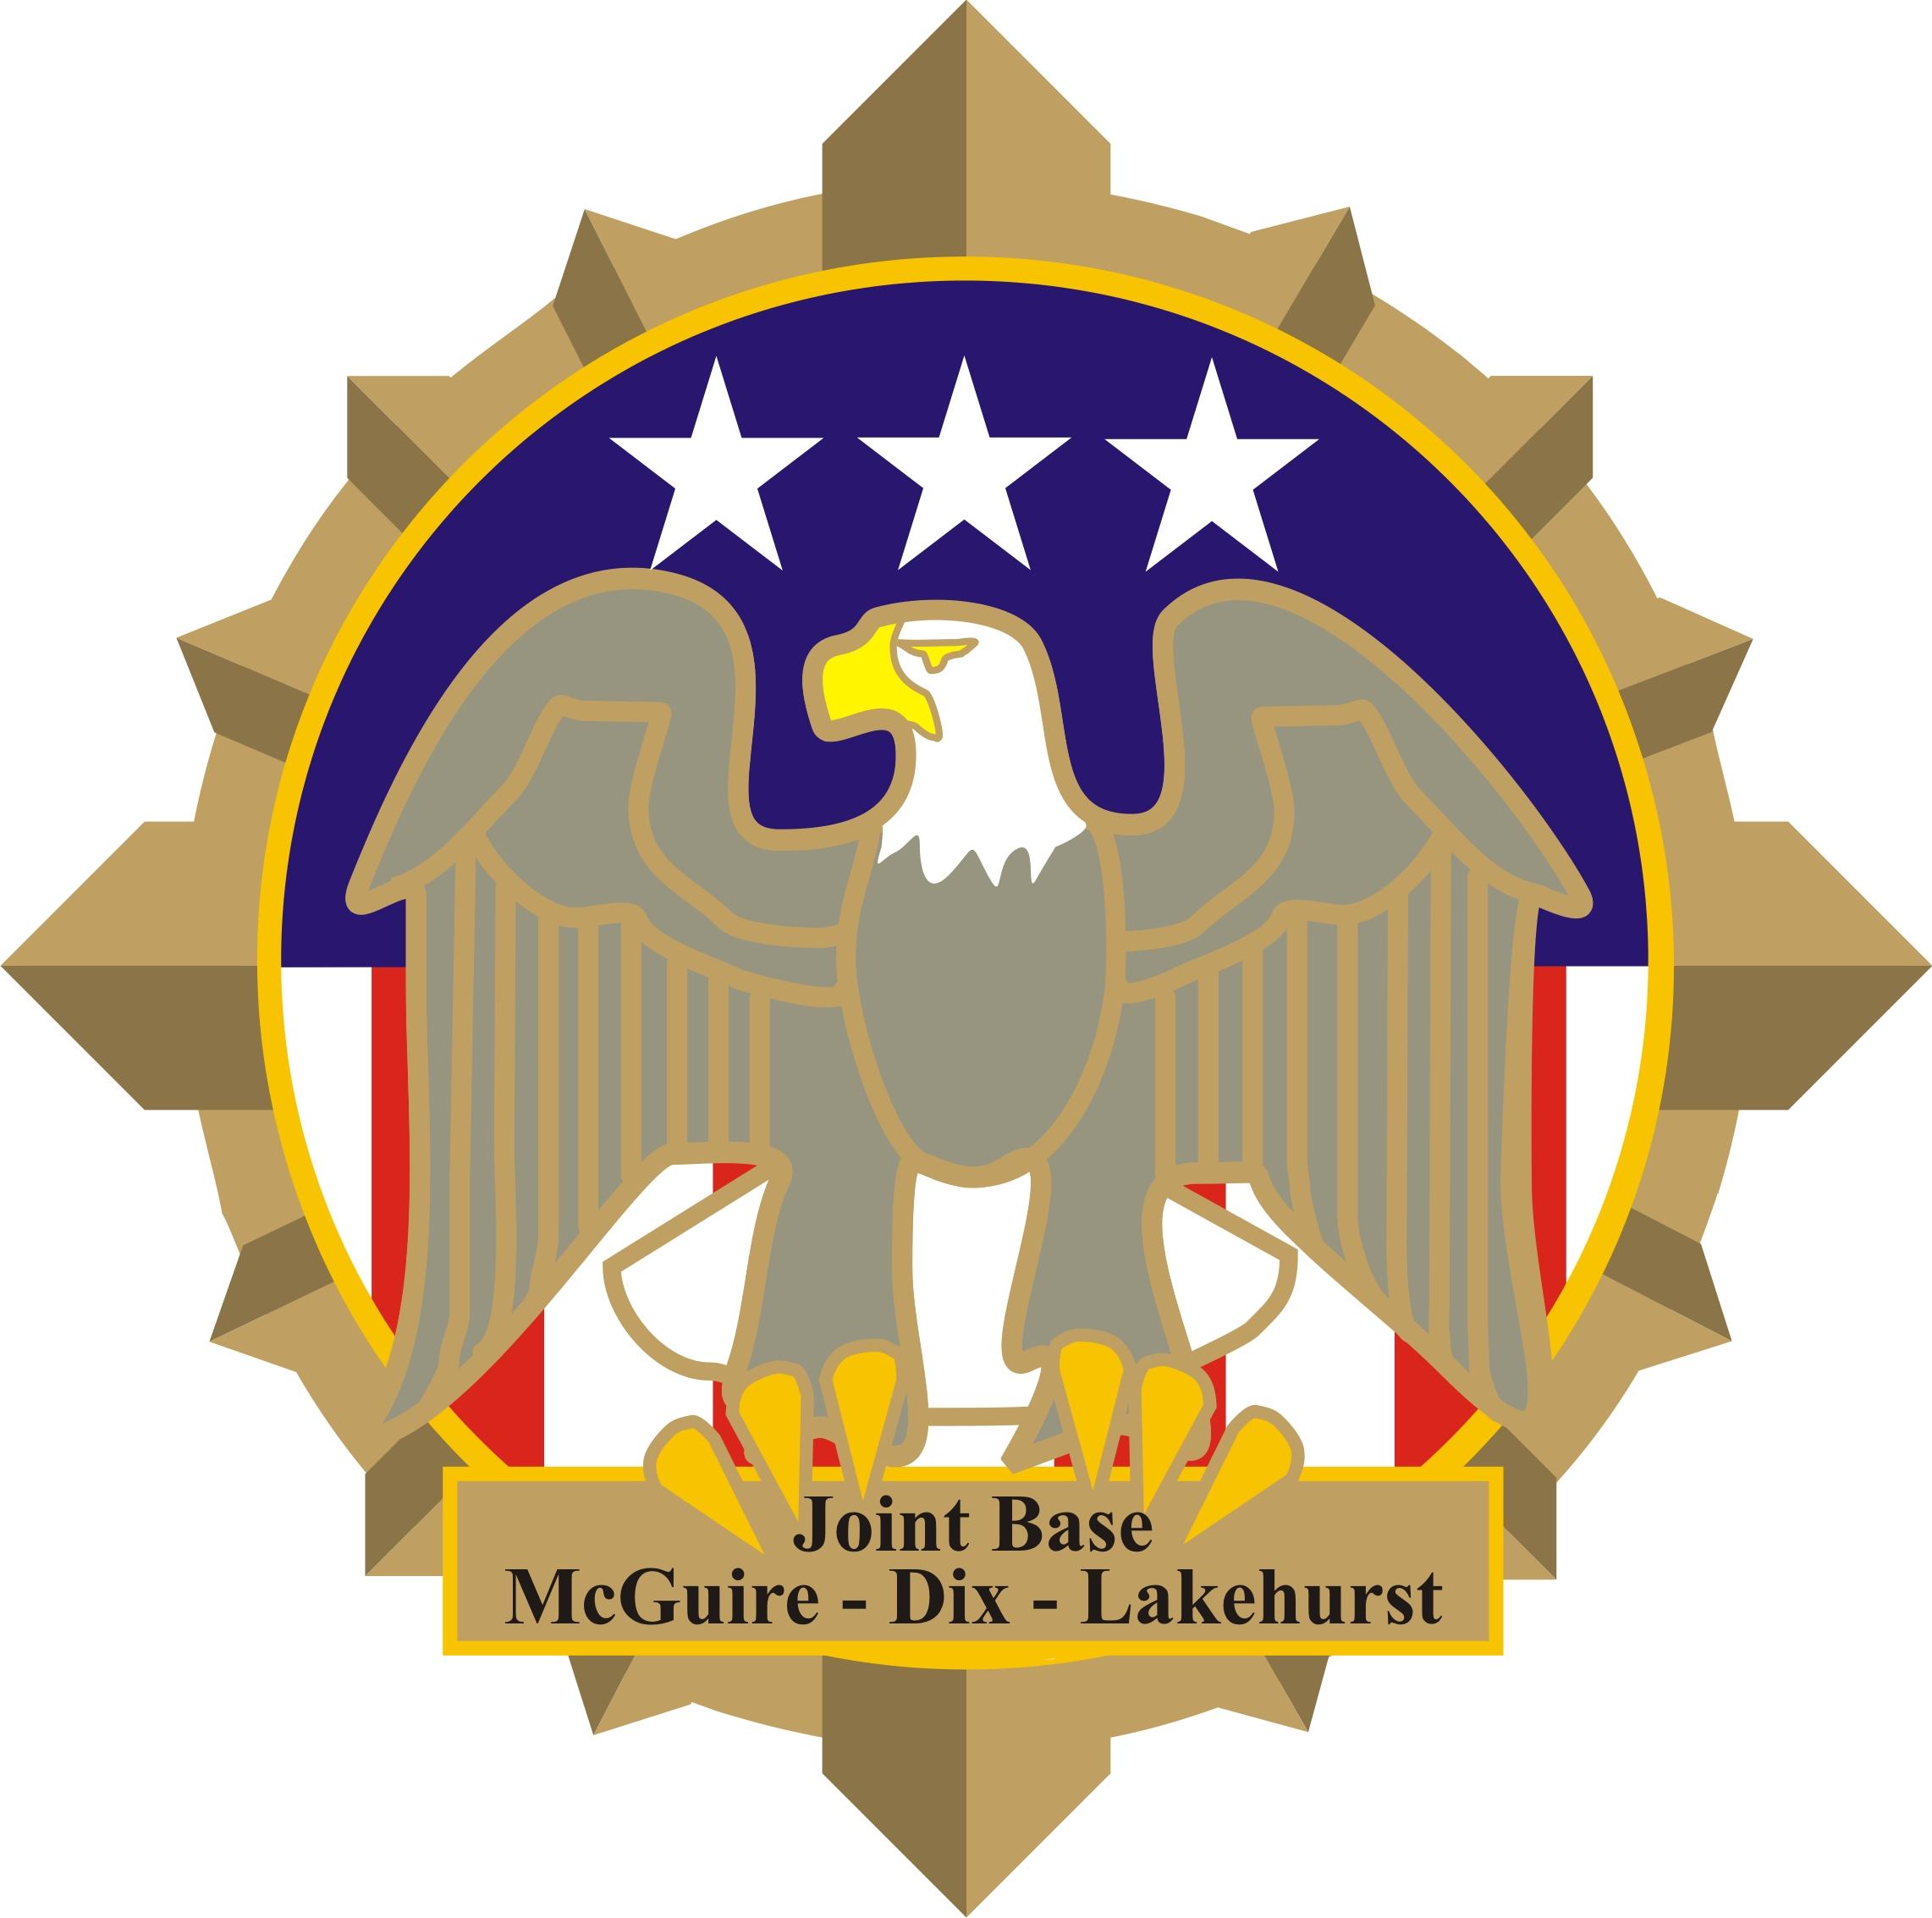 Armed Forces Sports Cism Usa Hosted Events Cism Wrestling 2014